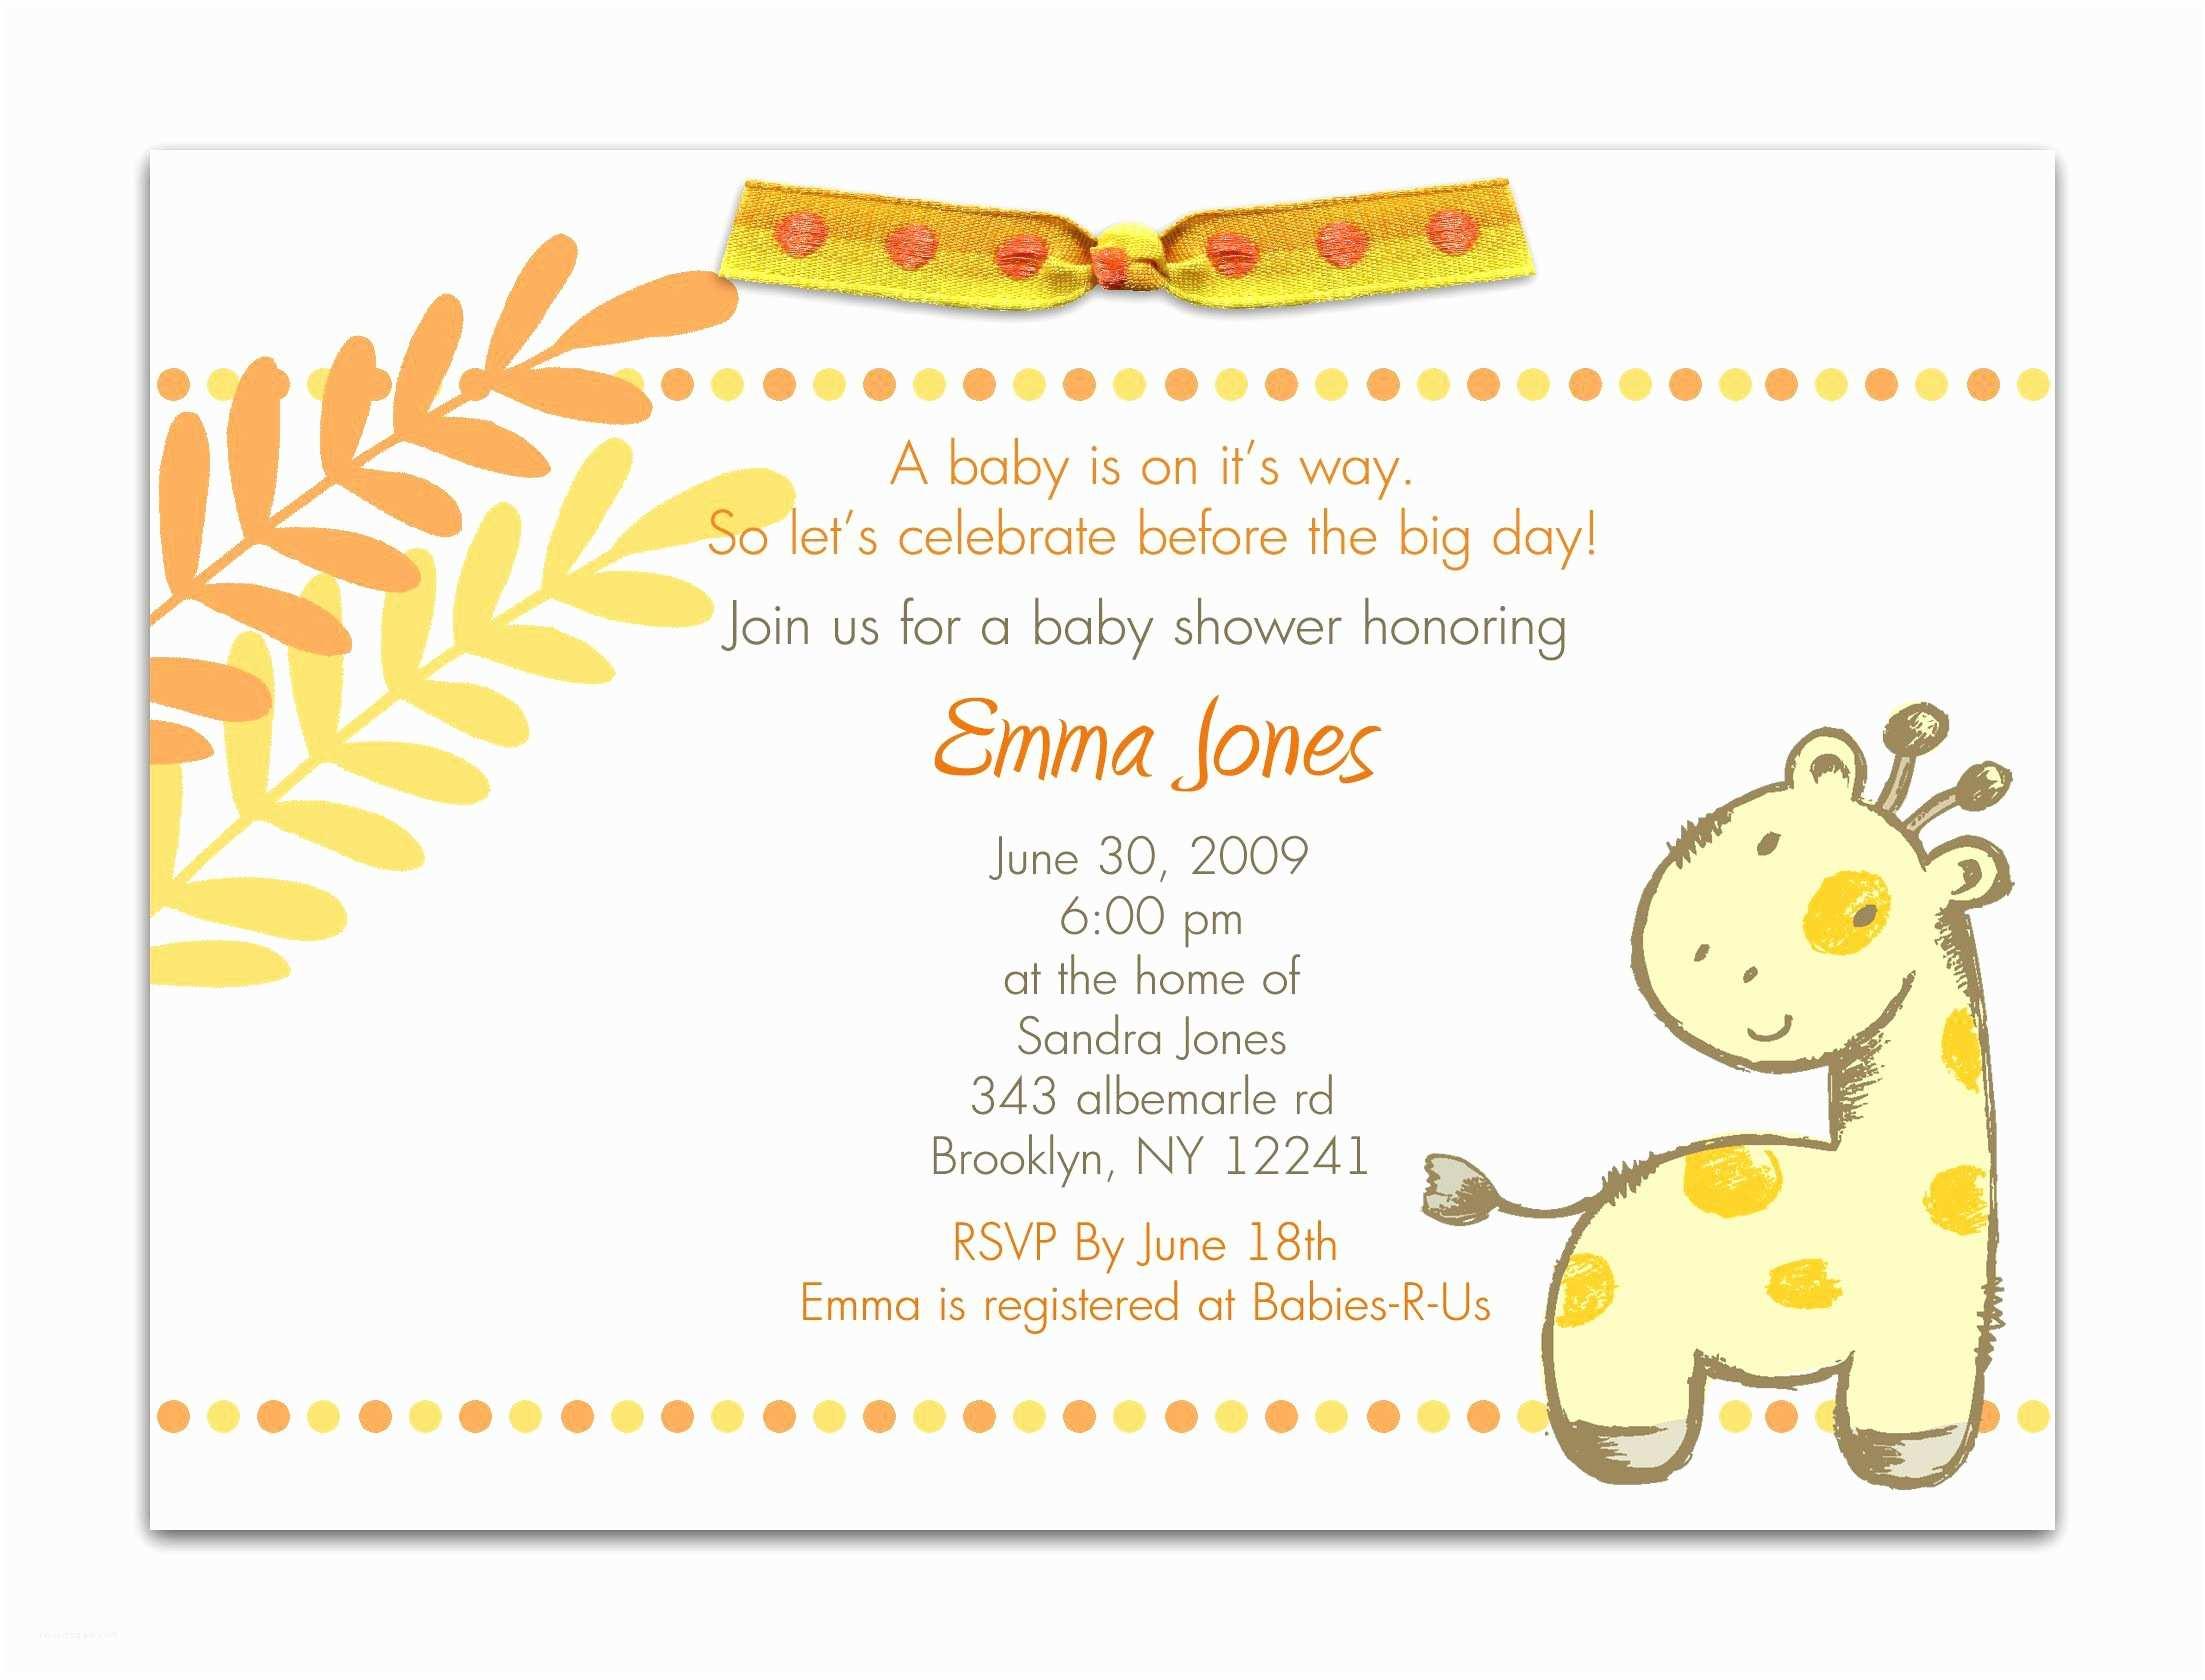 Baby Shower Invitation Ideas Baby Shower Invitation Baby Shower Invitations Templates